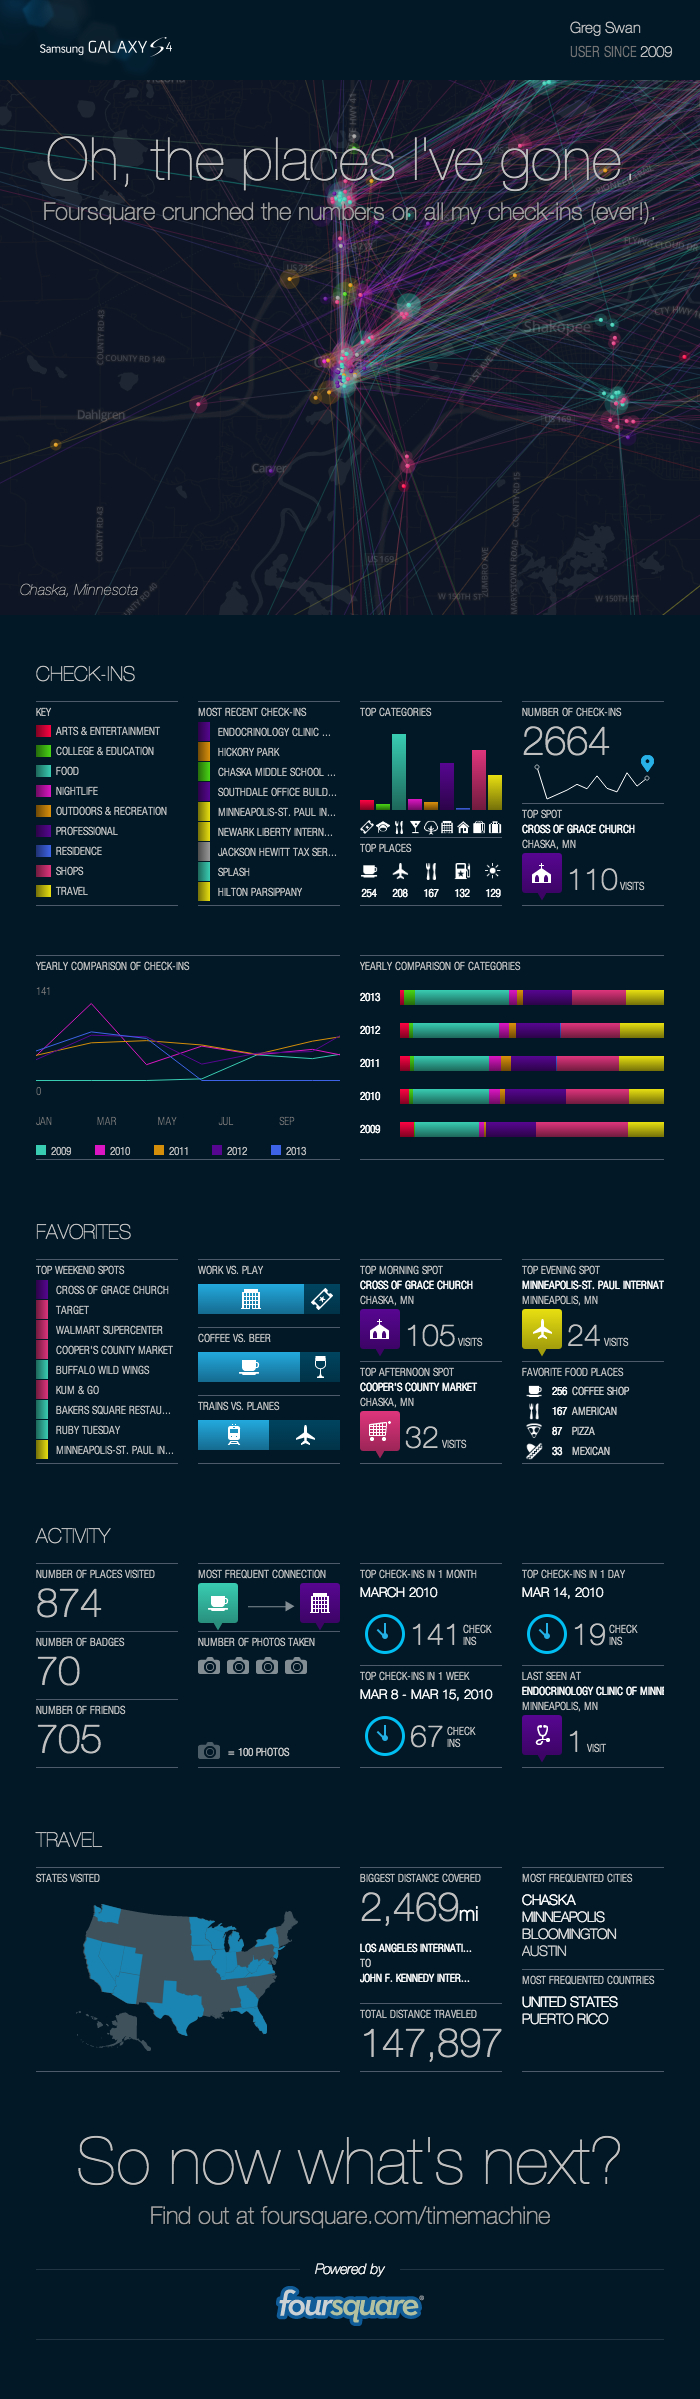 foursquare infographic greg swan